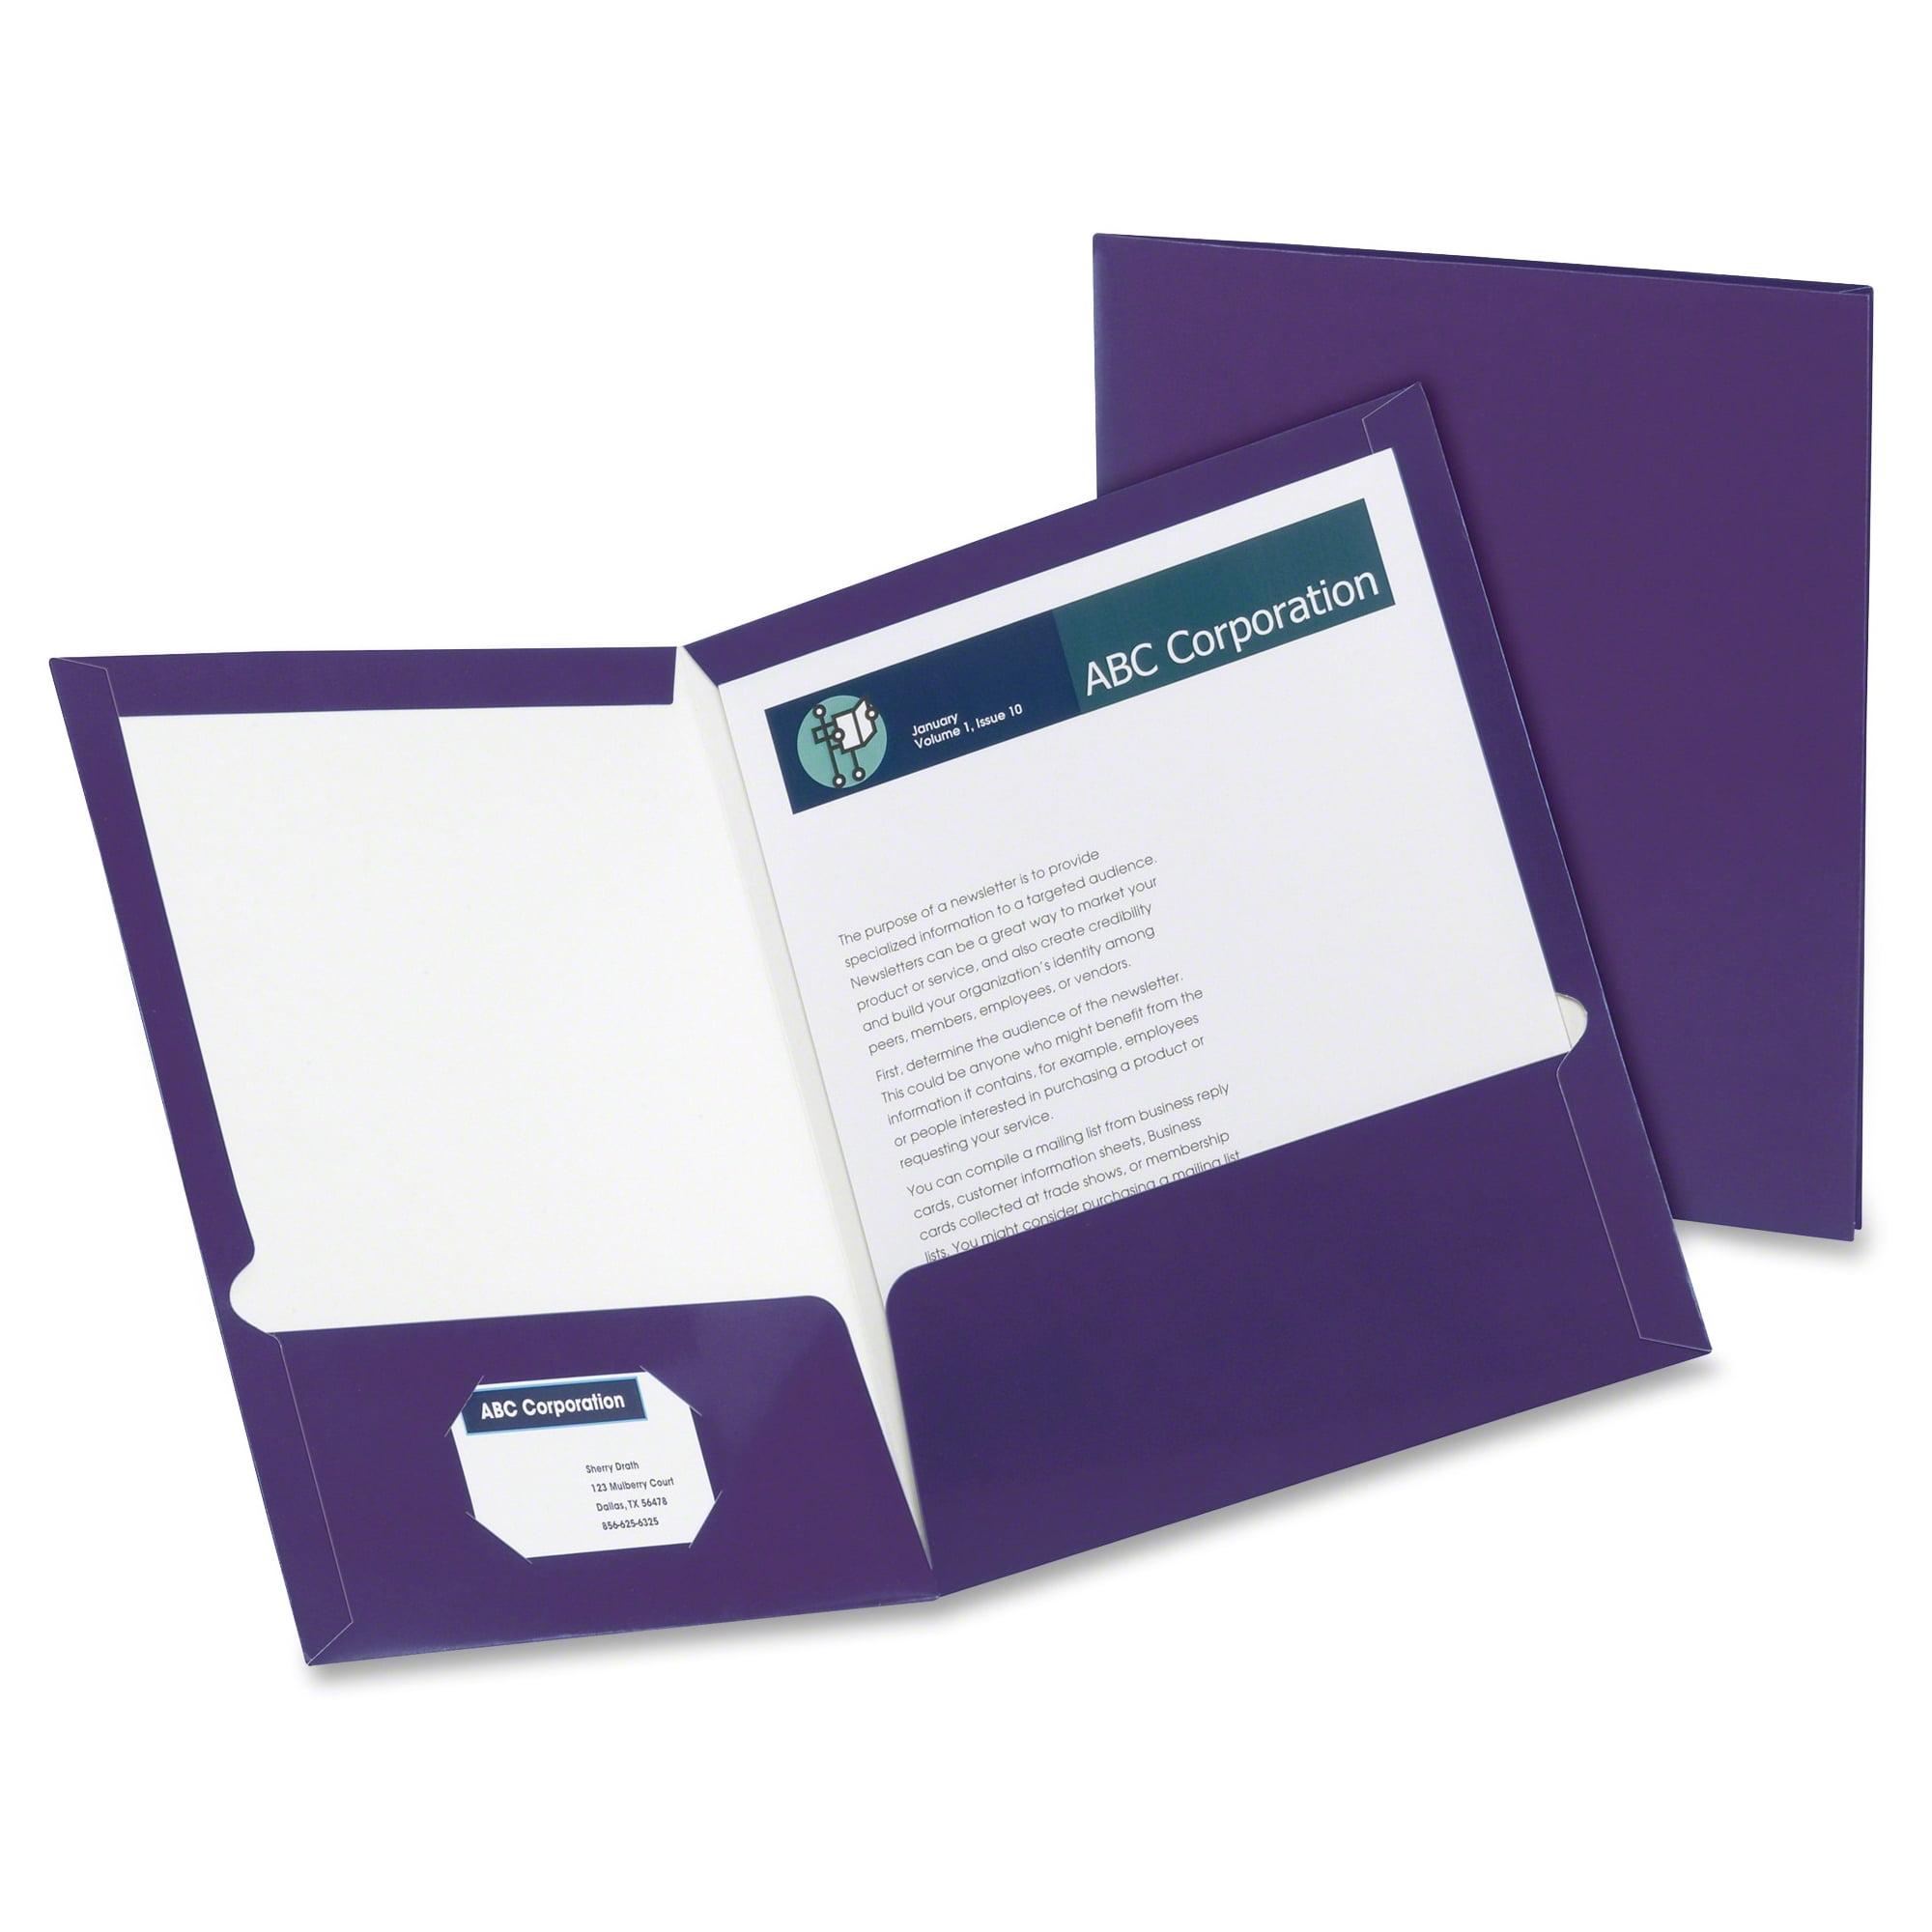 Oxford Metallic Two Pocket Folders - Walmart.com